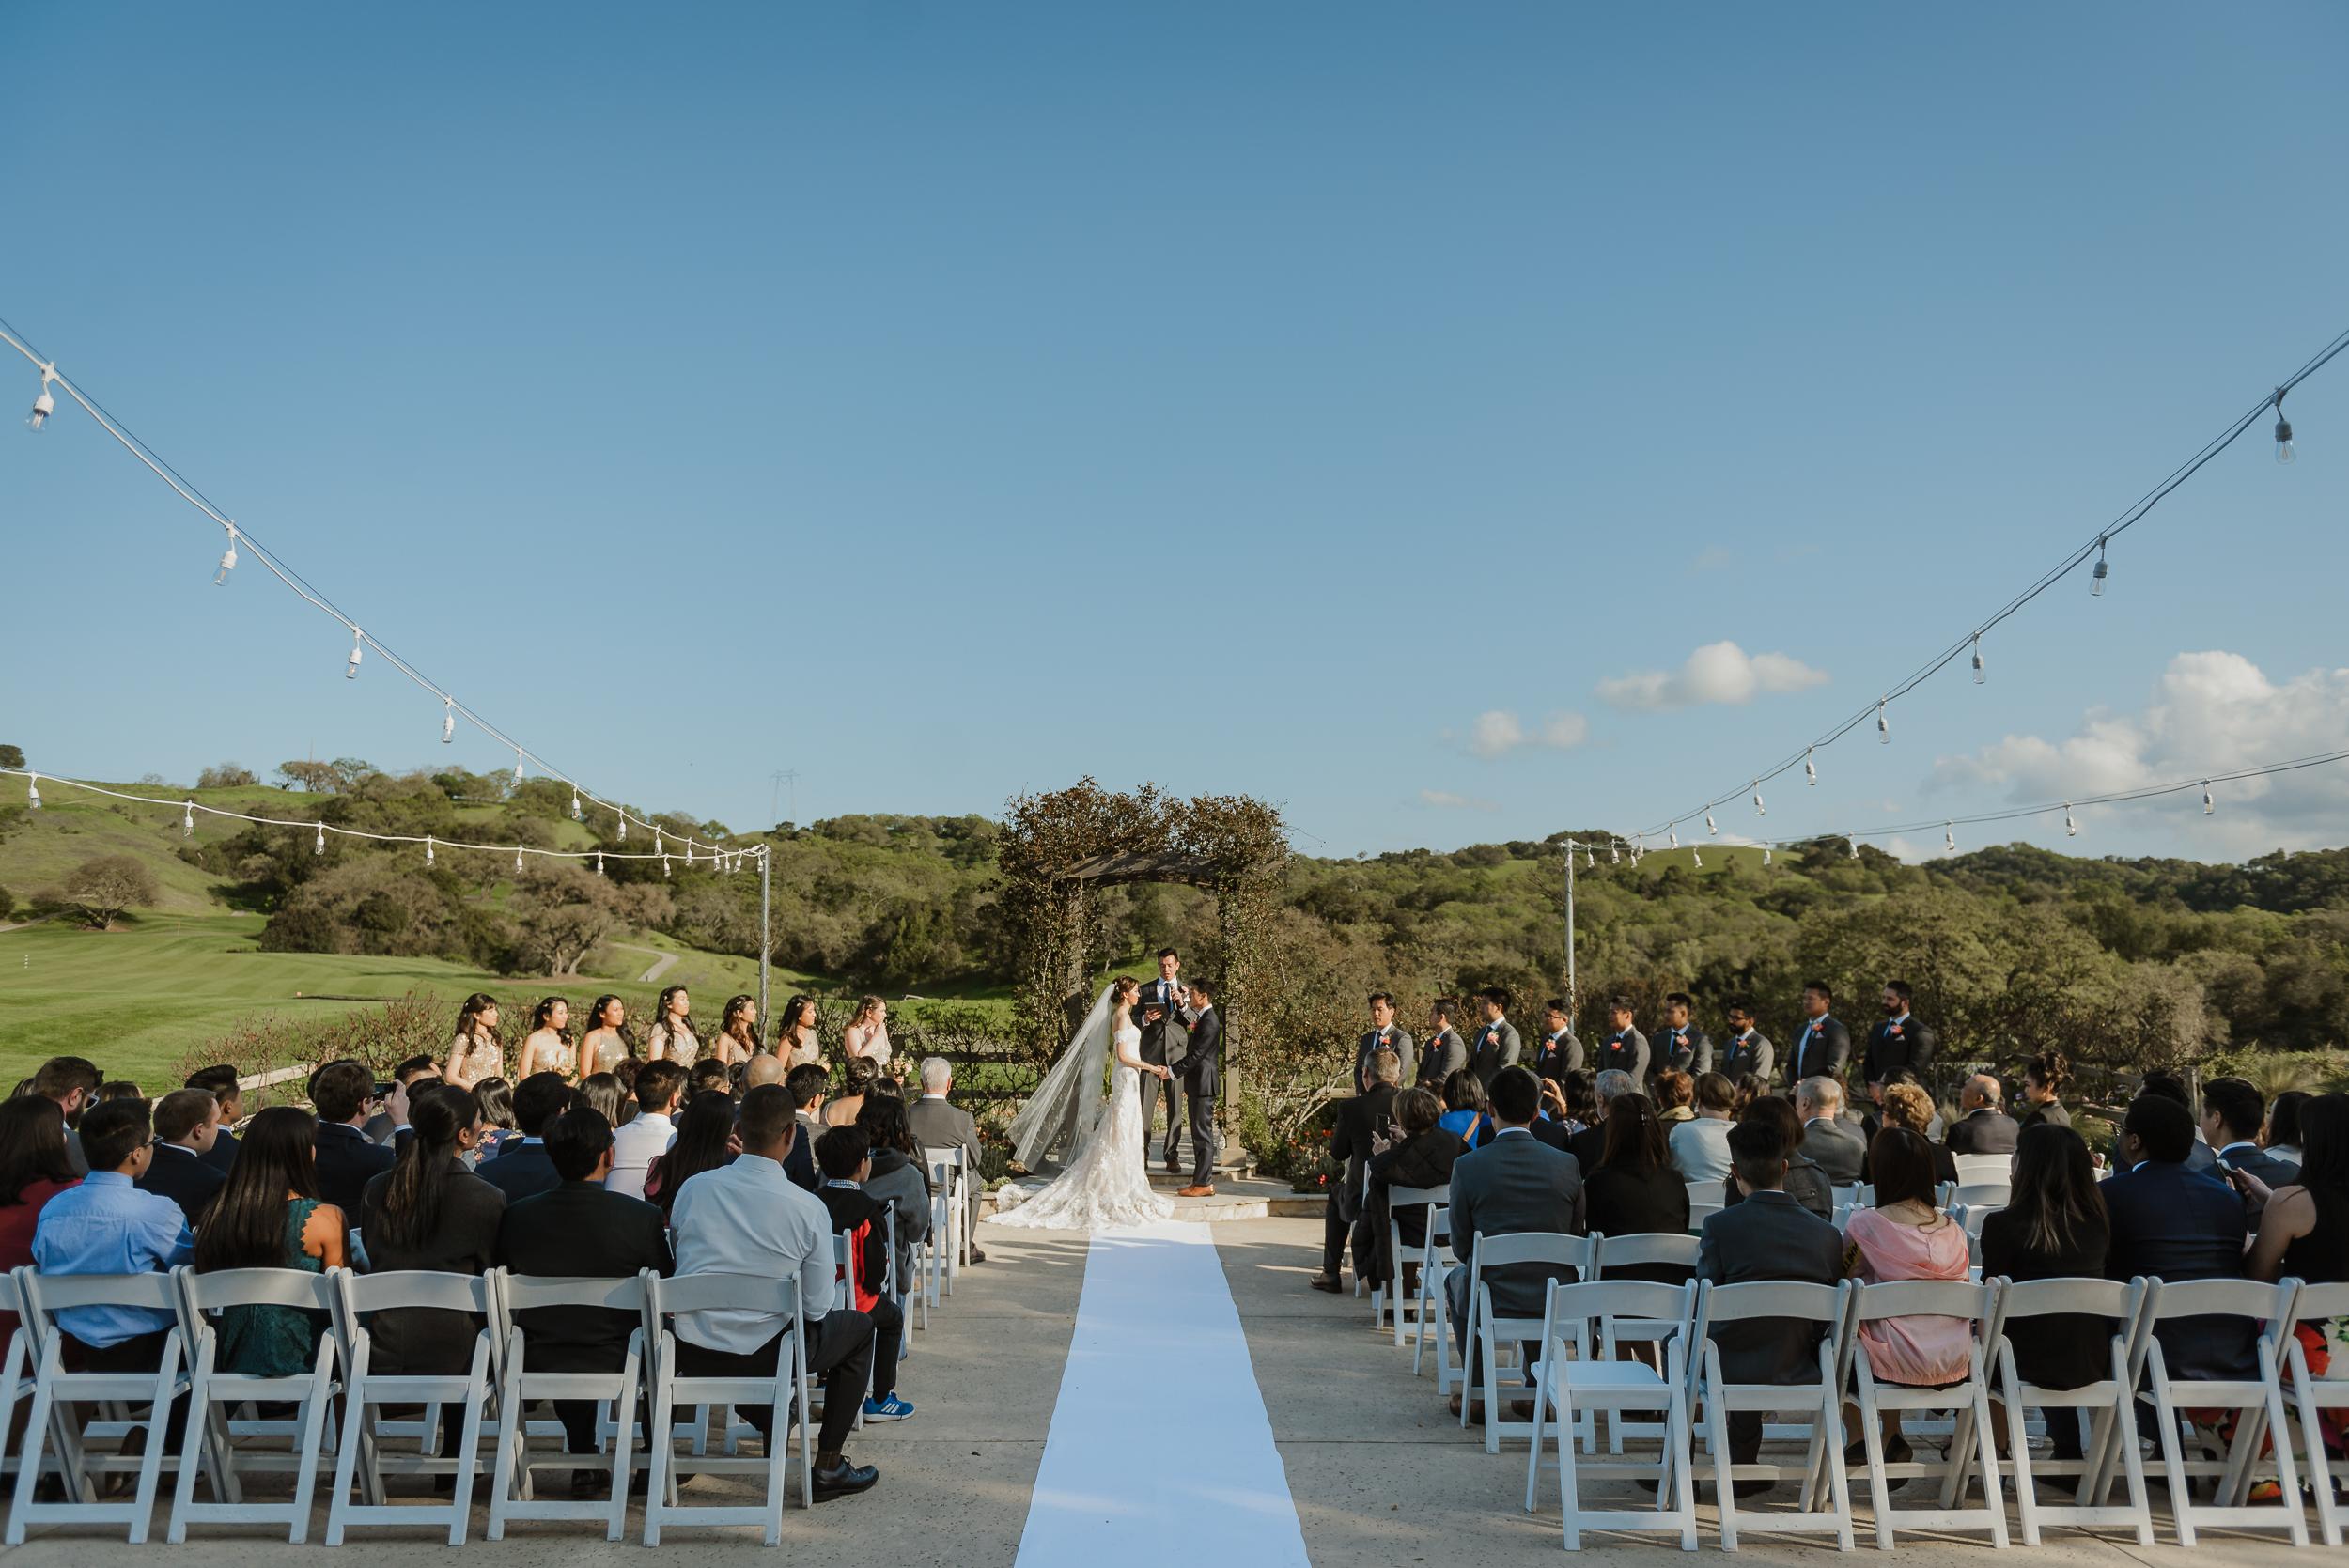 035san-jose-cinnabar-hills-golf-course-wedding-vivianchen-215.jpg